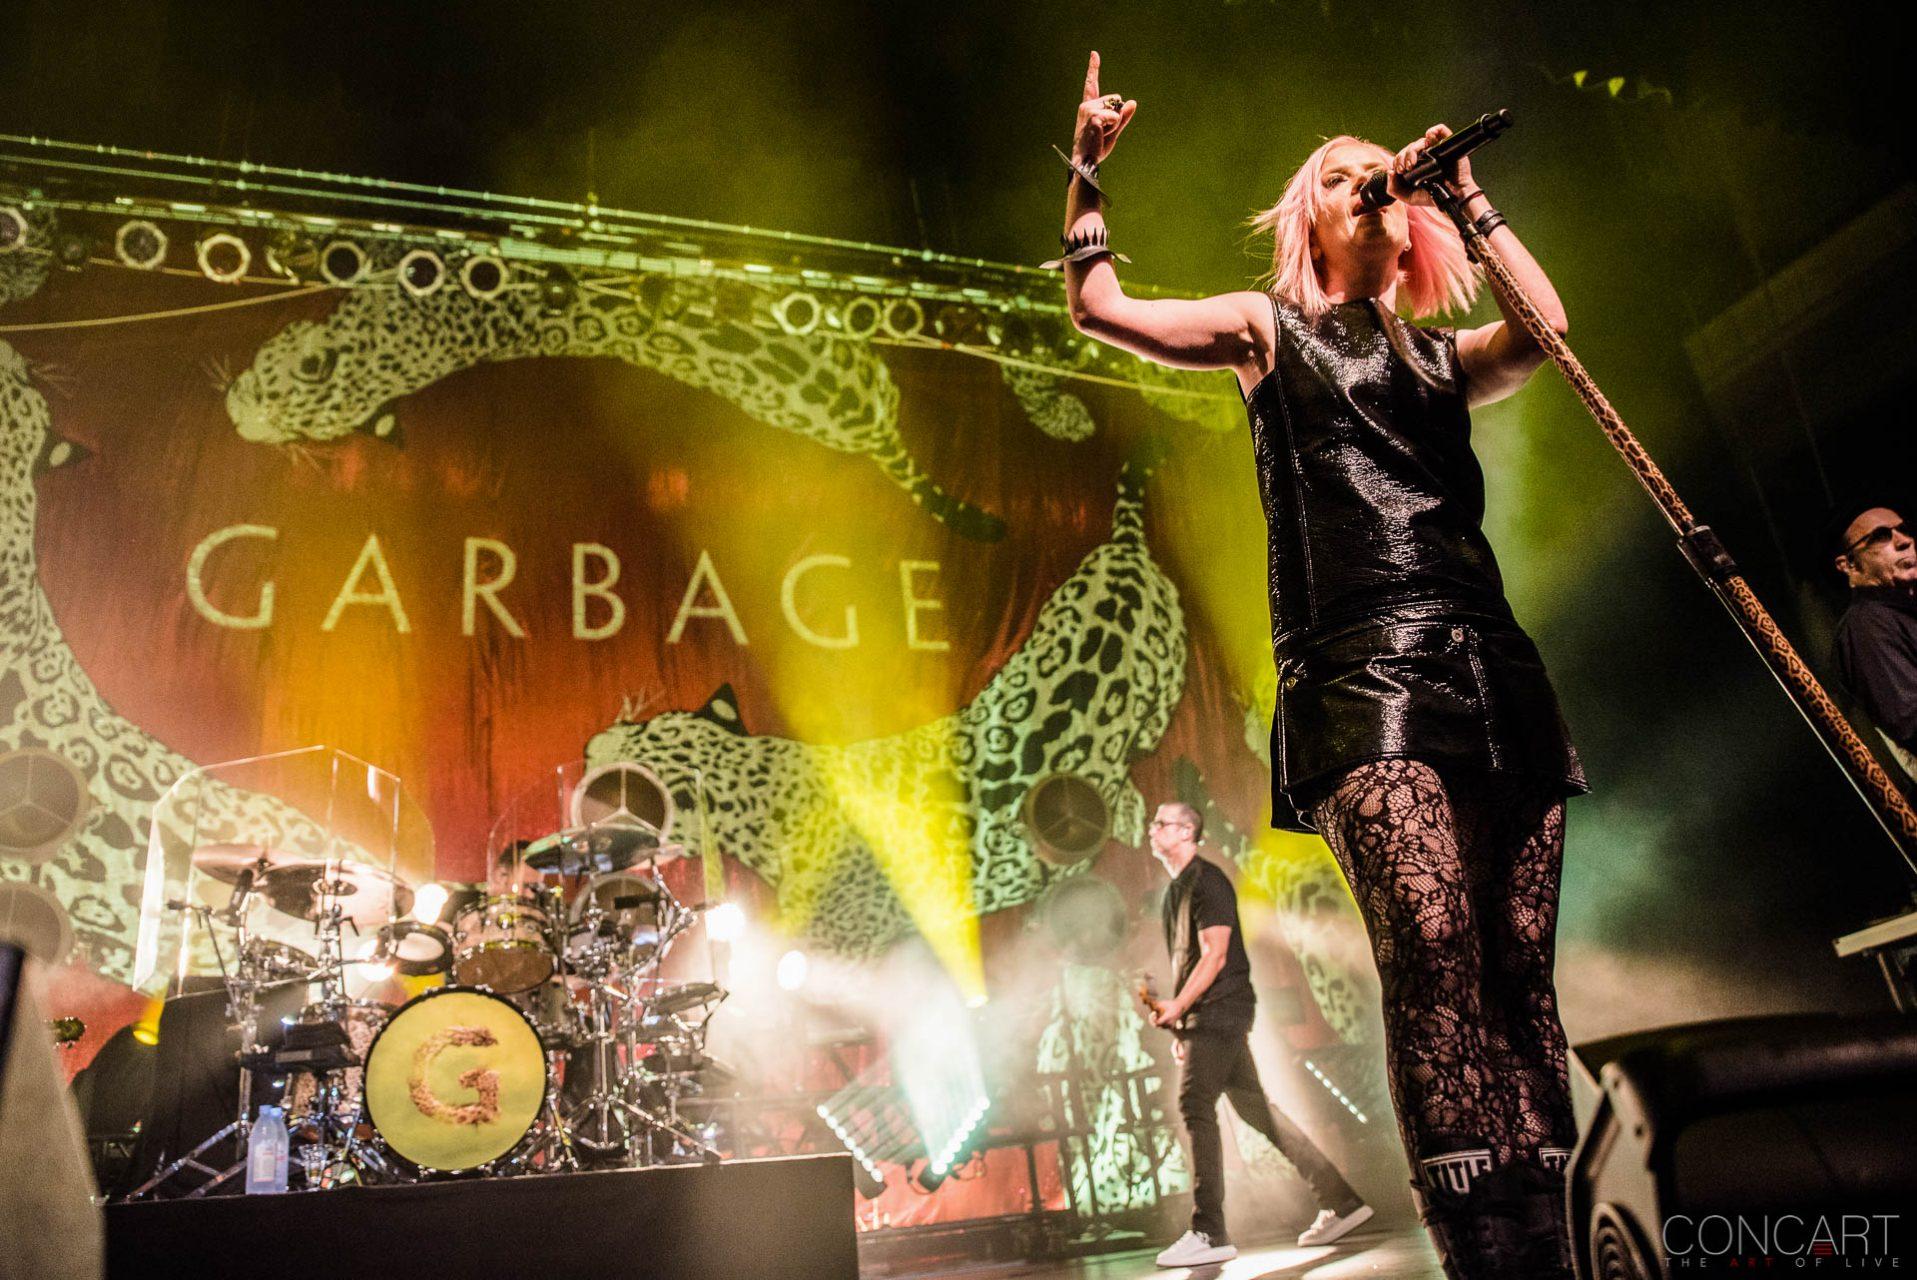 Garbage photo by Ashley Adcox 3